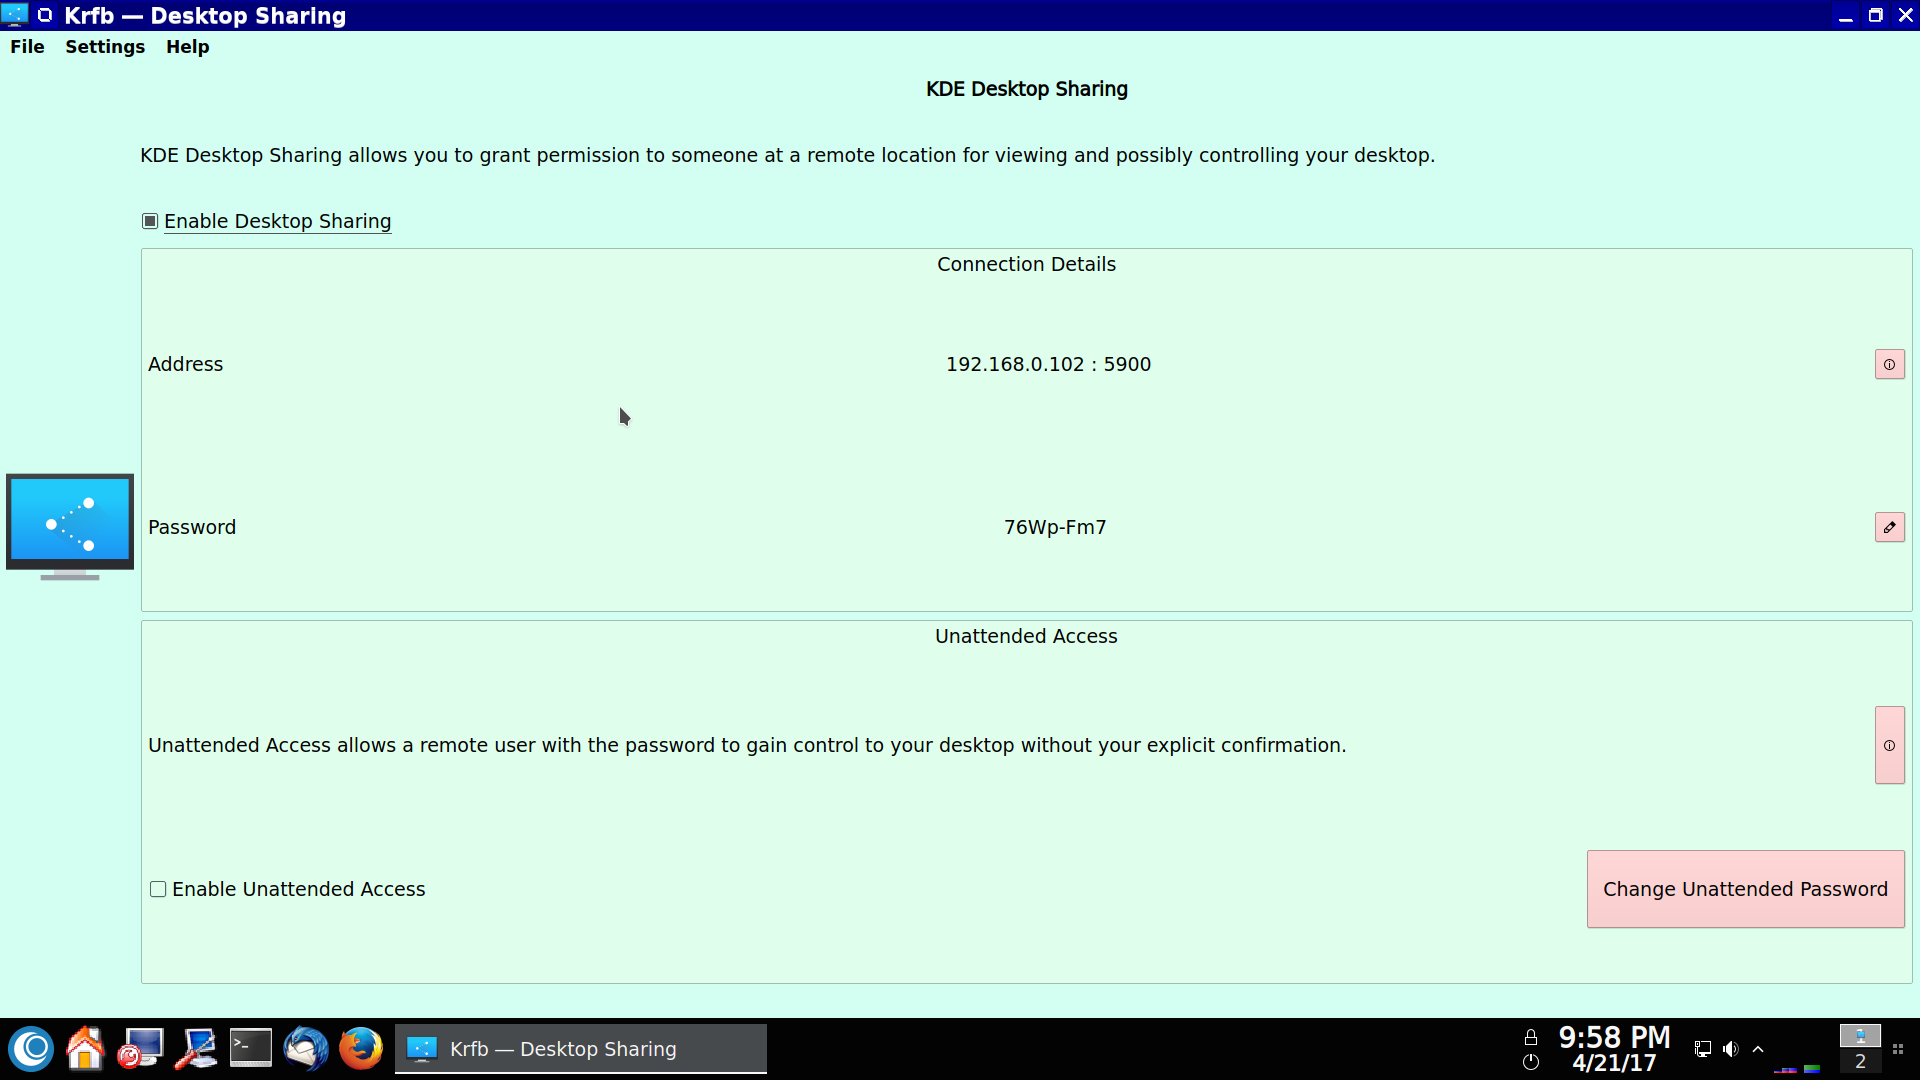 OpenMandriva Lx 3 02 development continues - Development